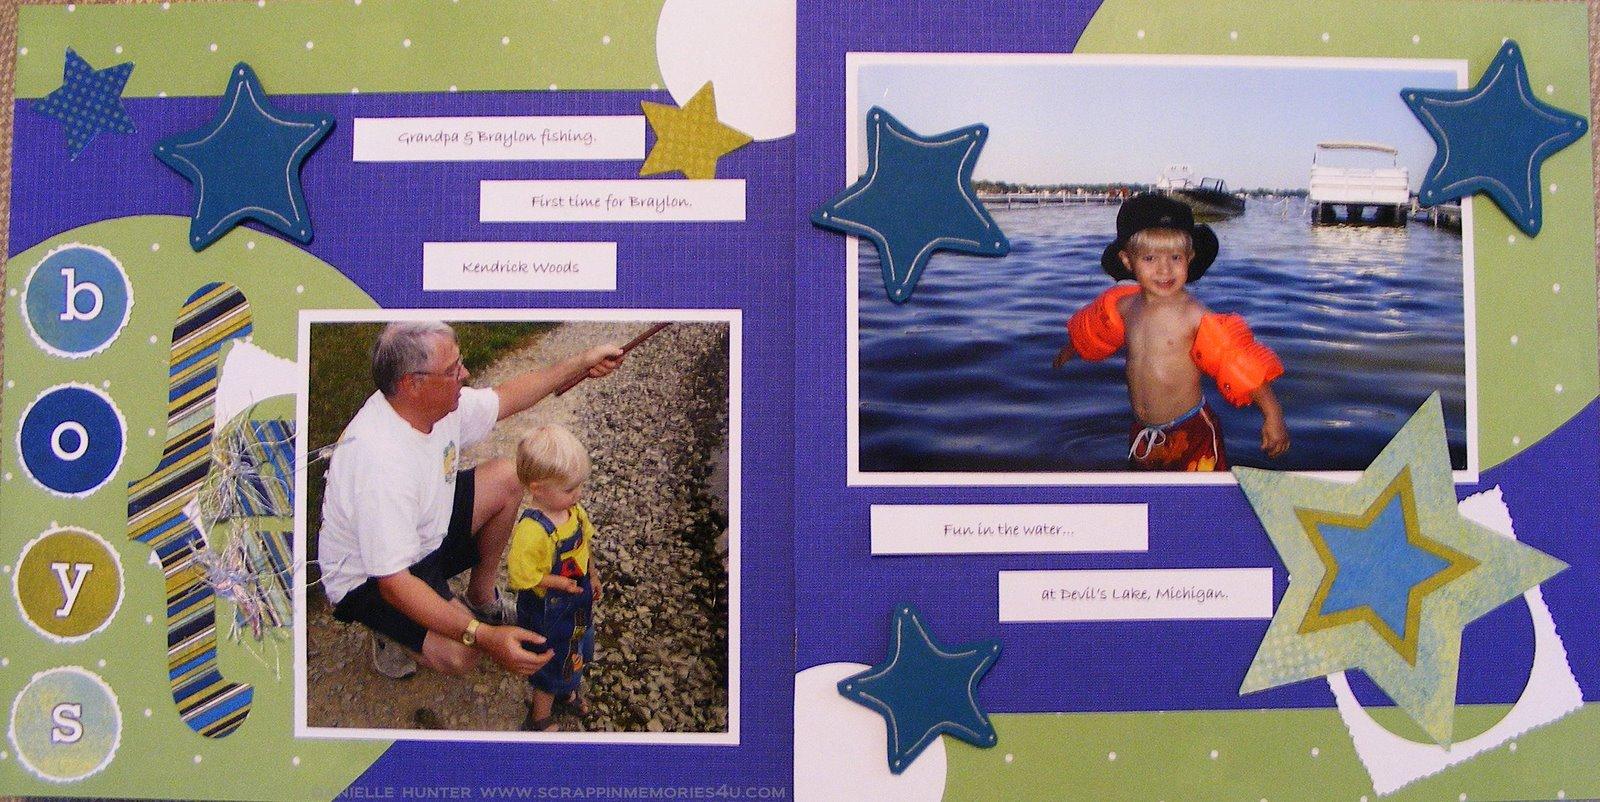 How to scrapbook 8x8 layouts - Scrapbook Layouts That Celebrate Children